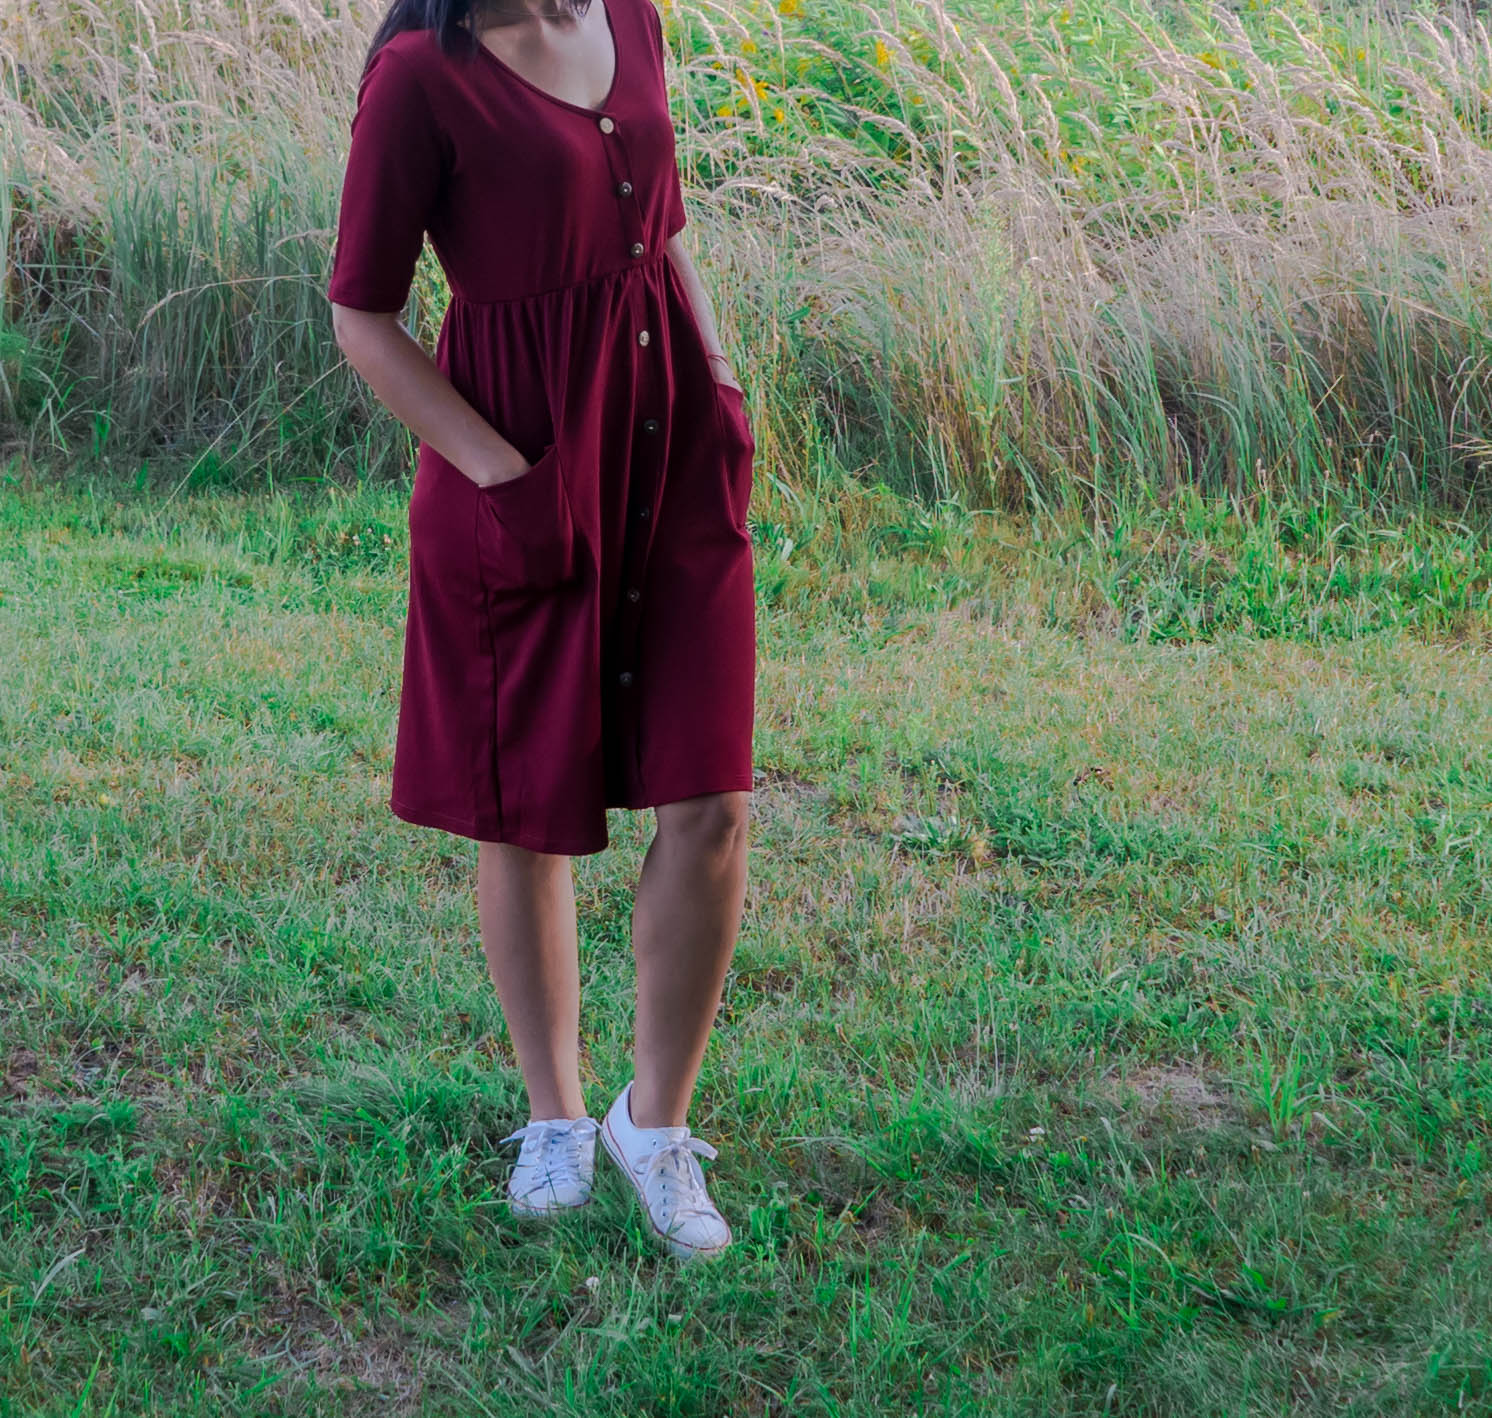 modne sukienki jesień 2020